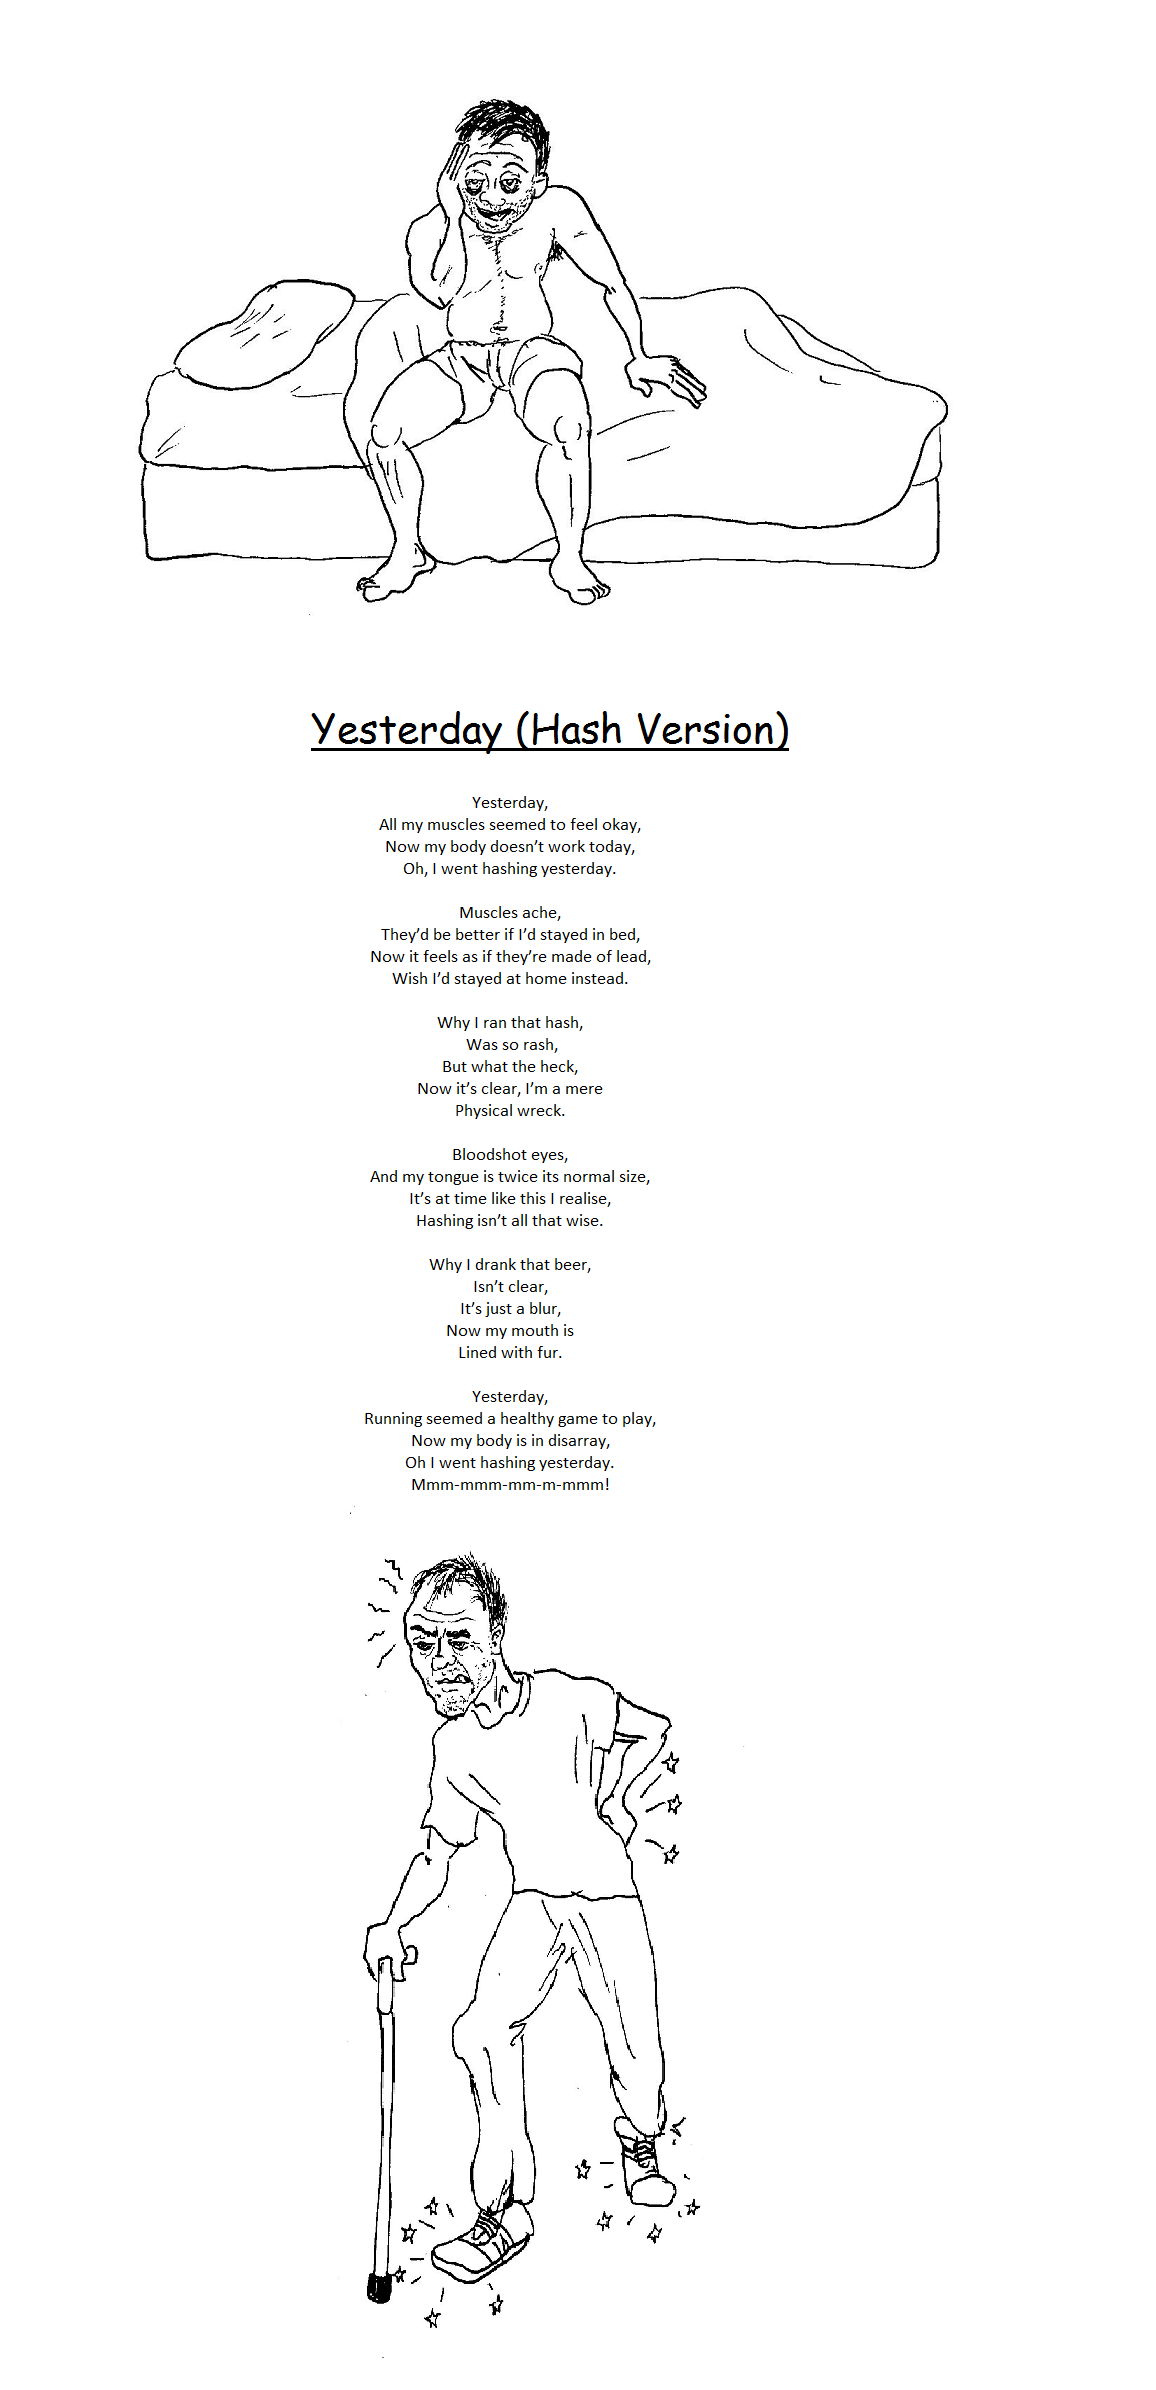 Yesterday (Hash Version)